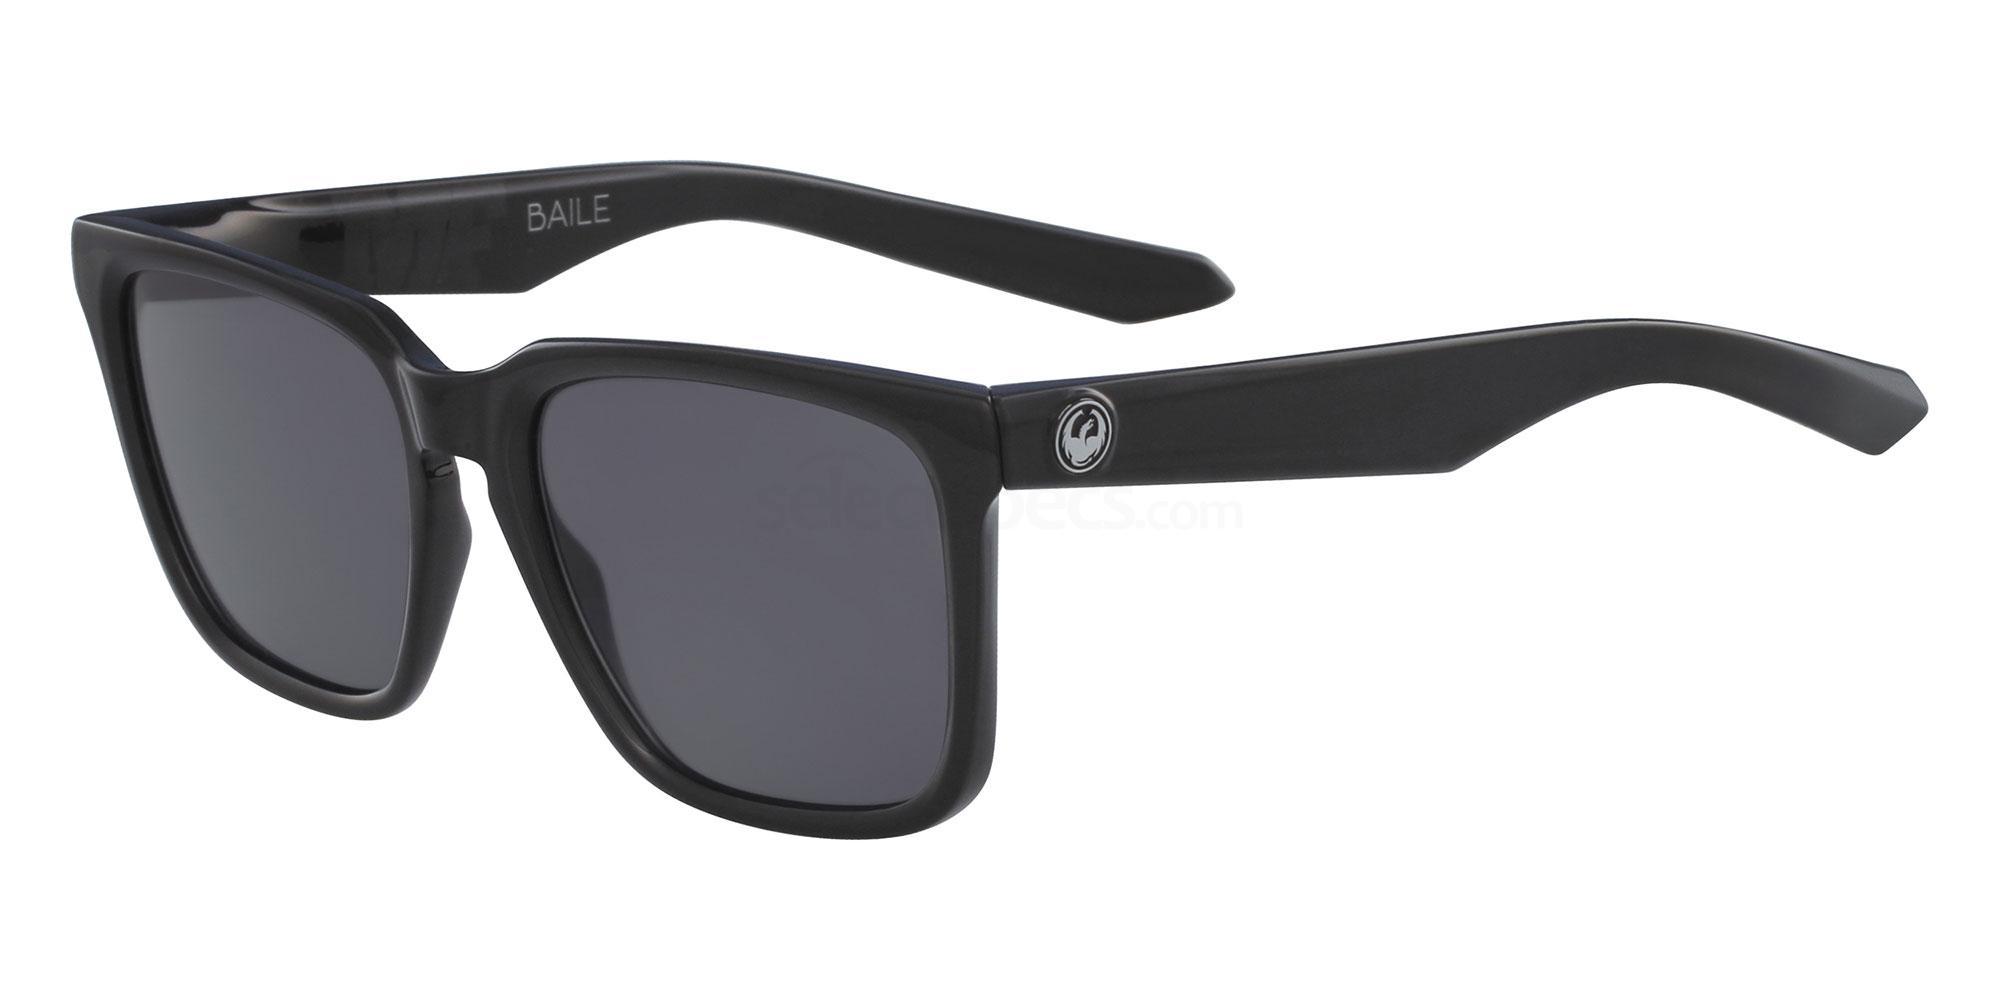 001 DR BAILE LL Sunglasses, Dragon